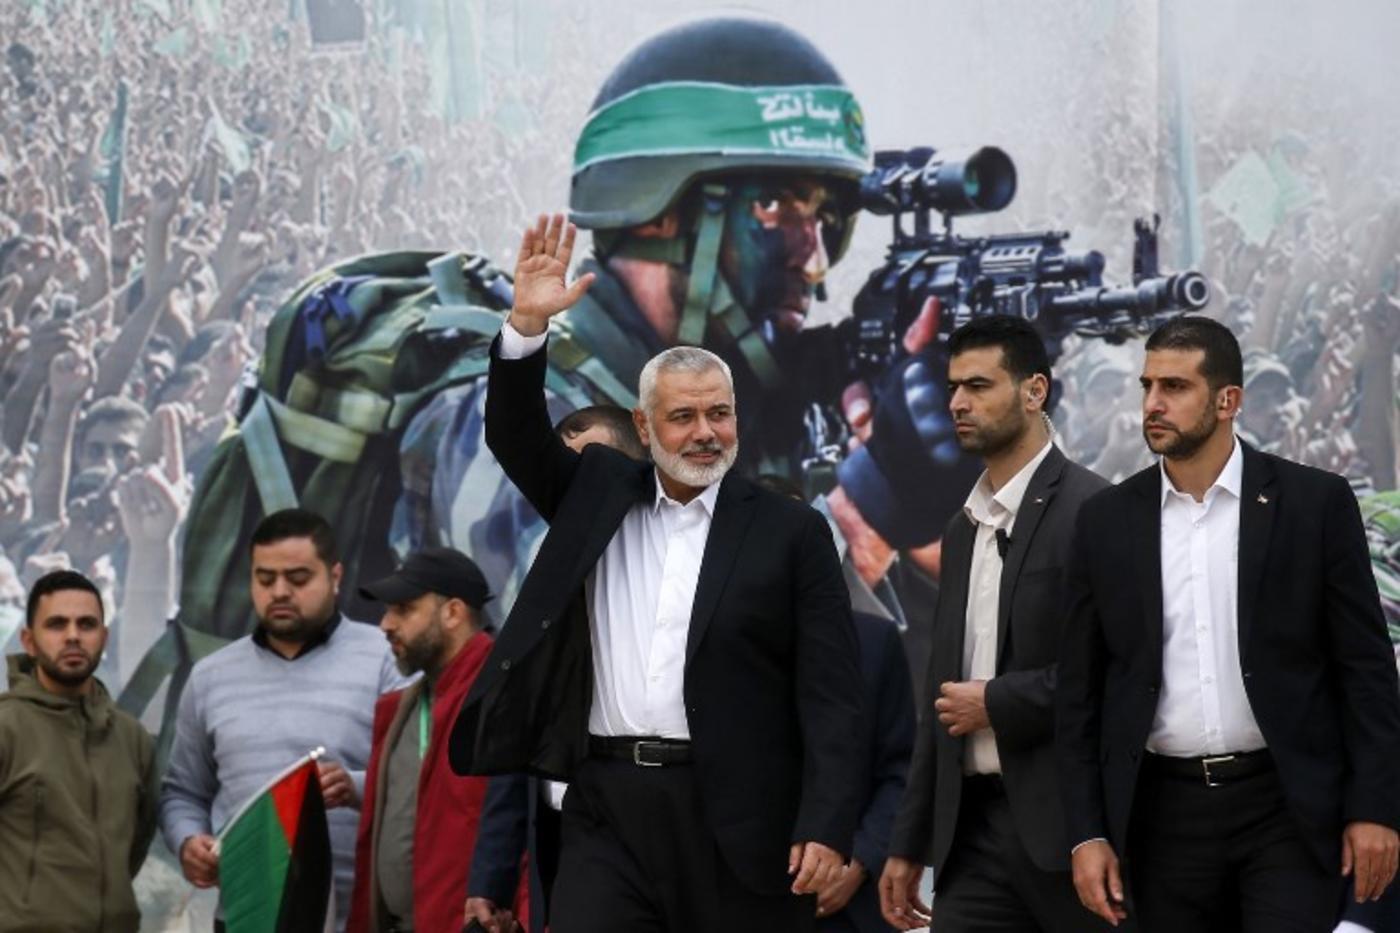 Hamas calls for Palestinian unity as it celebrates founding ...